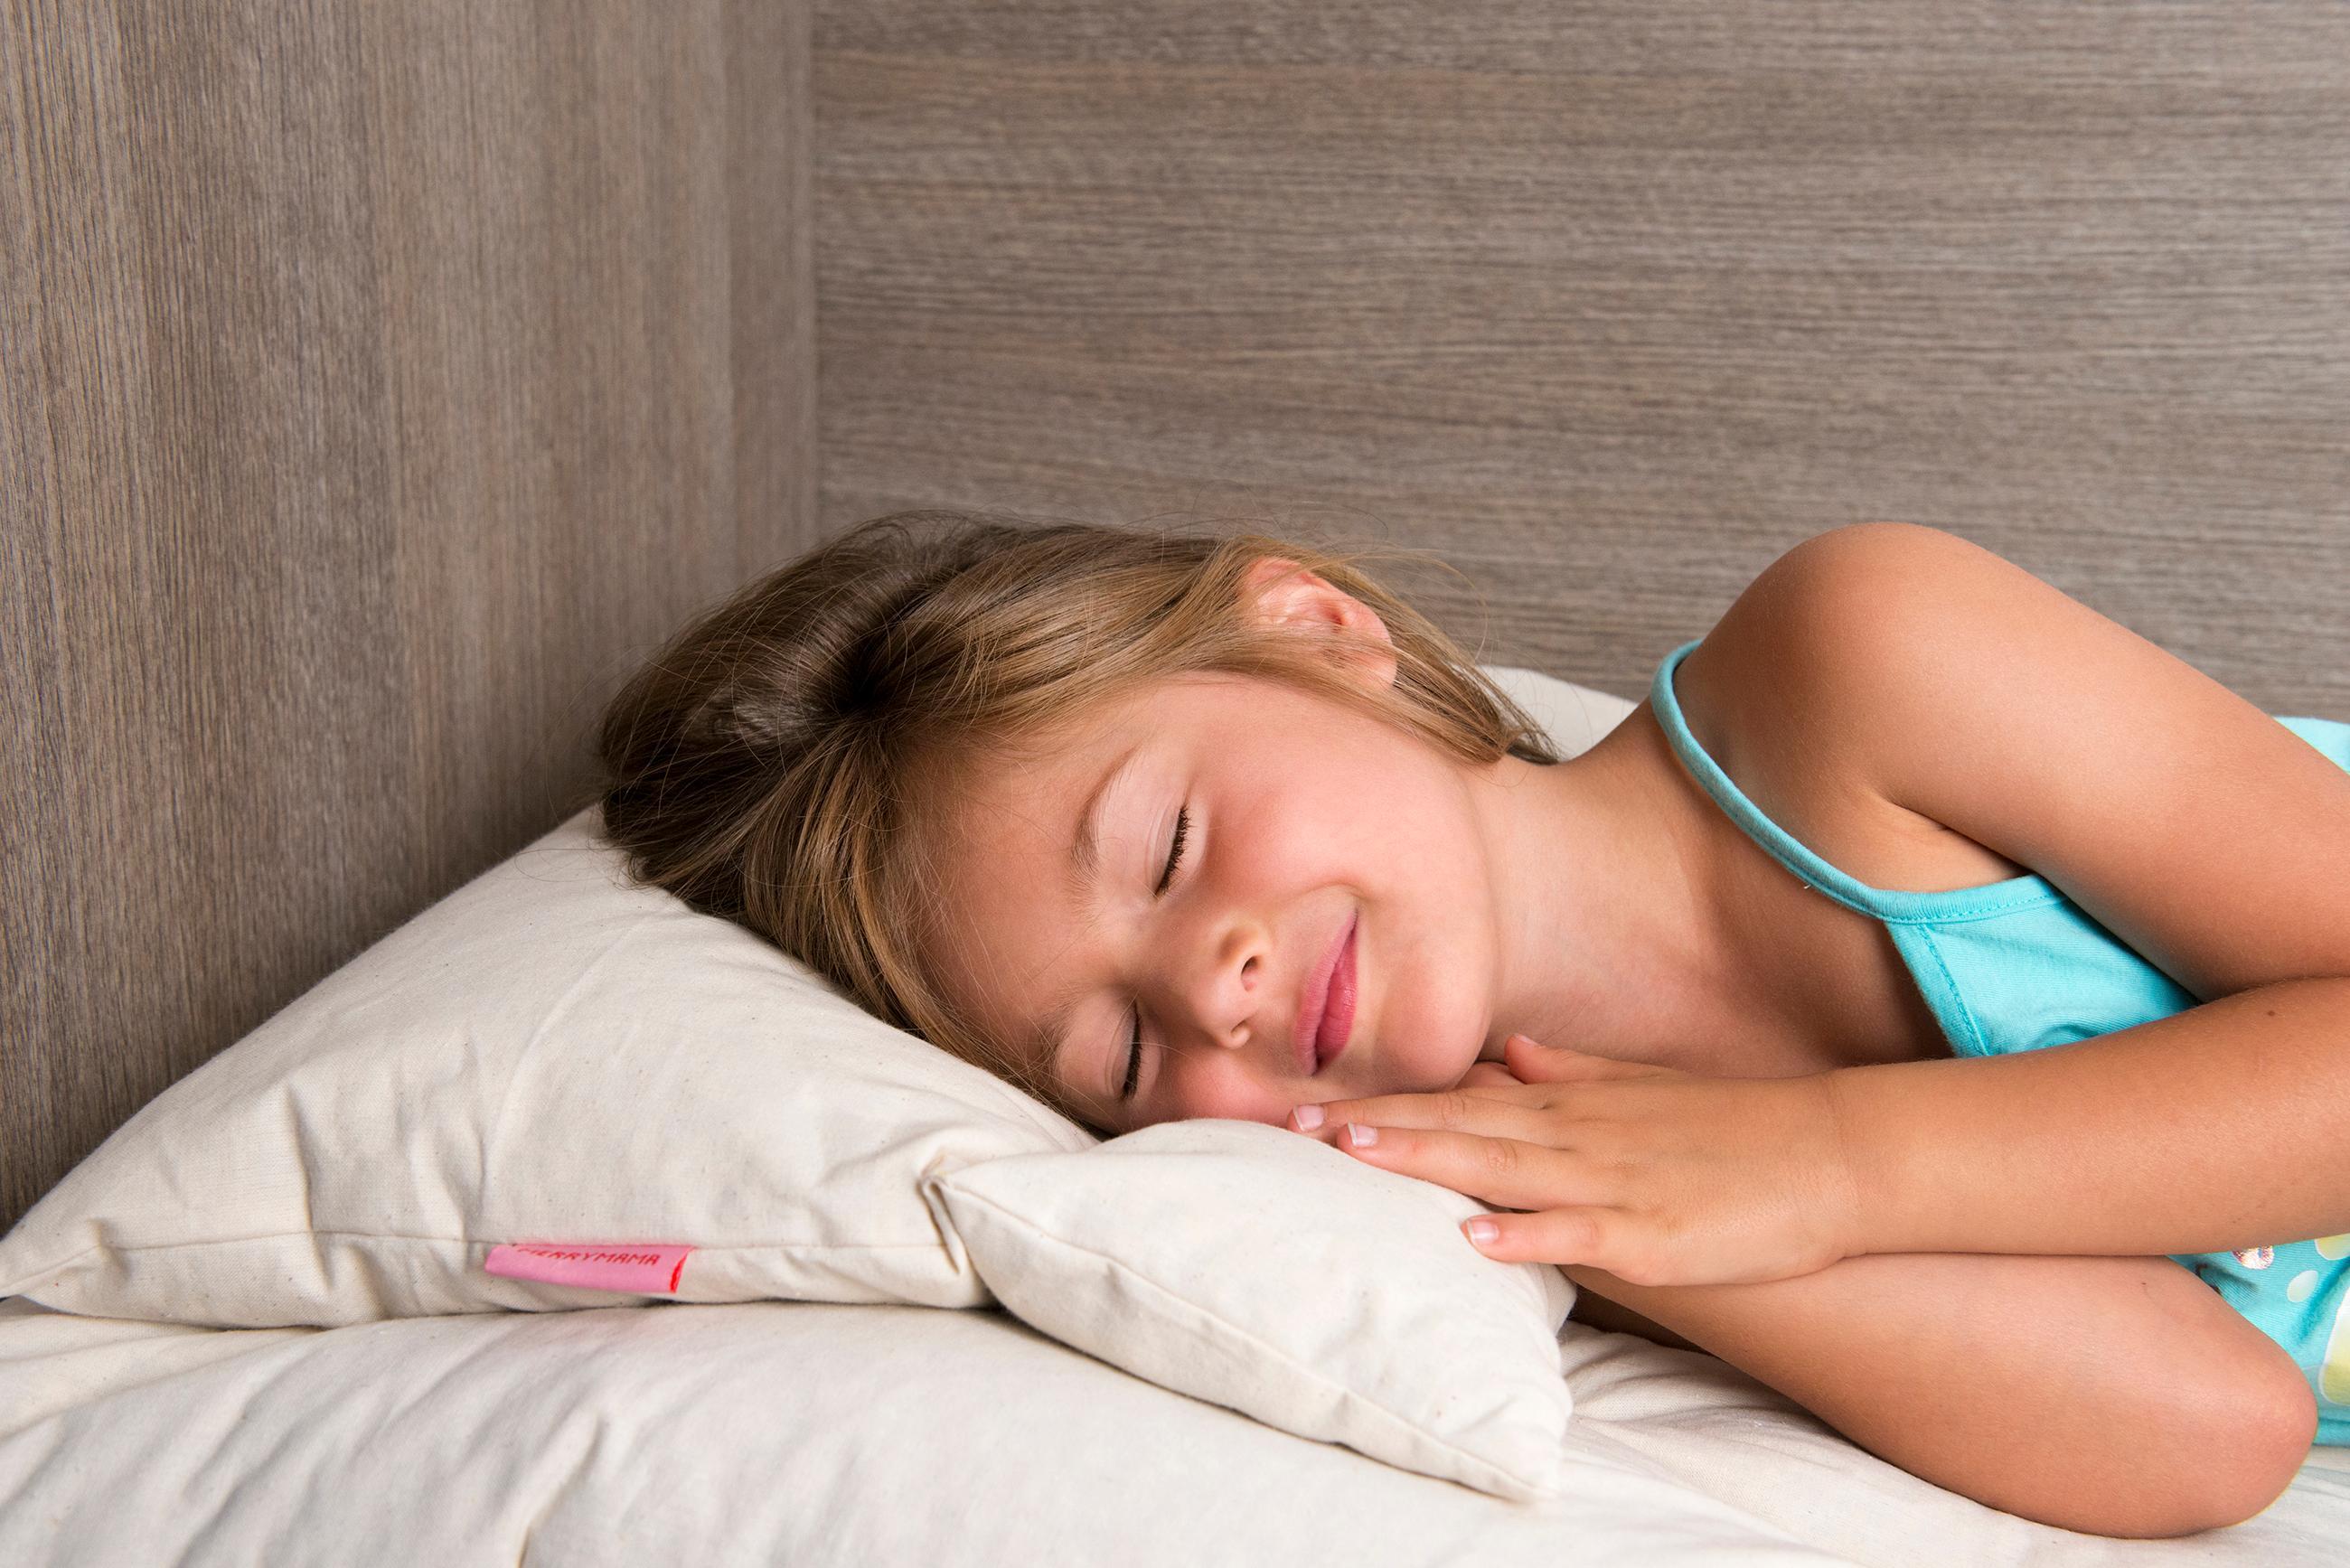 Merrymama cuscino guanciale lettino in pula di farro biologica cm